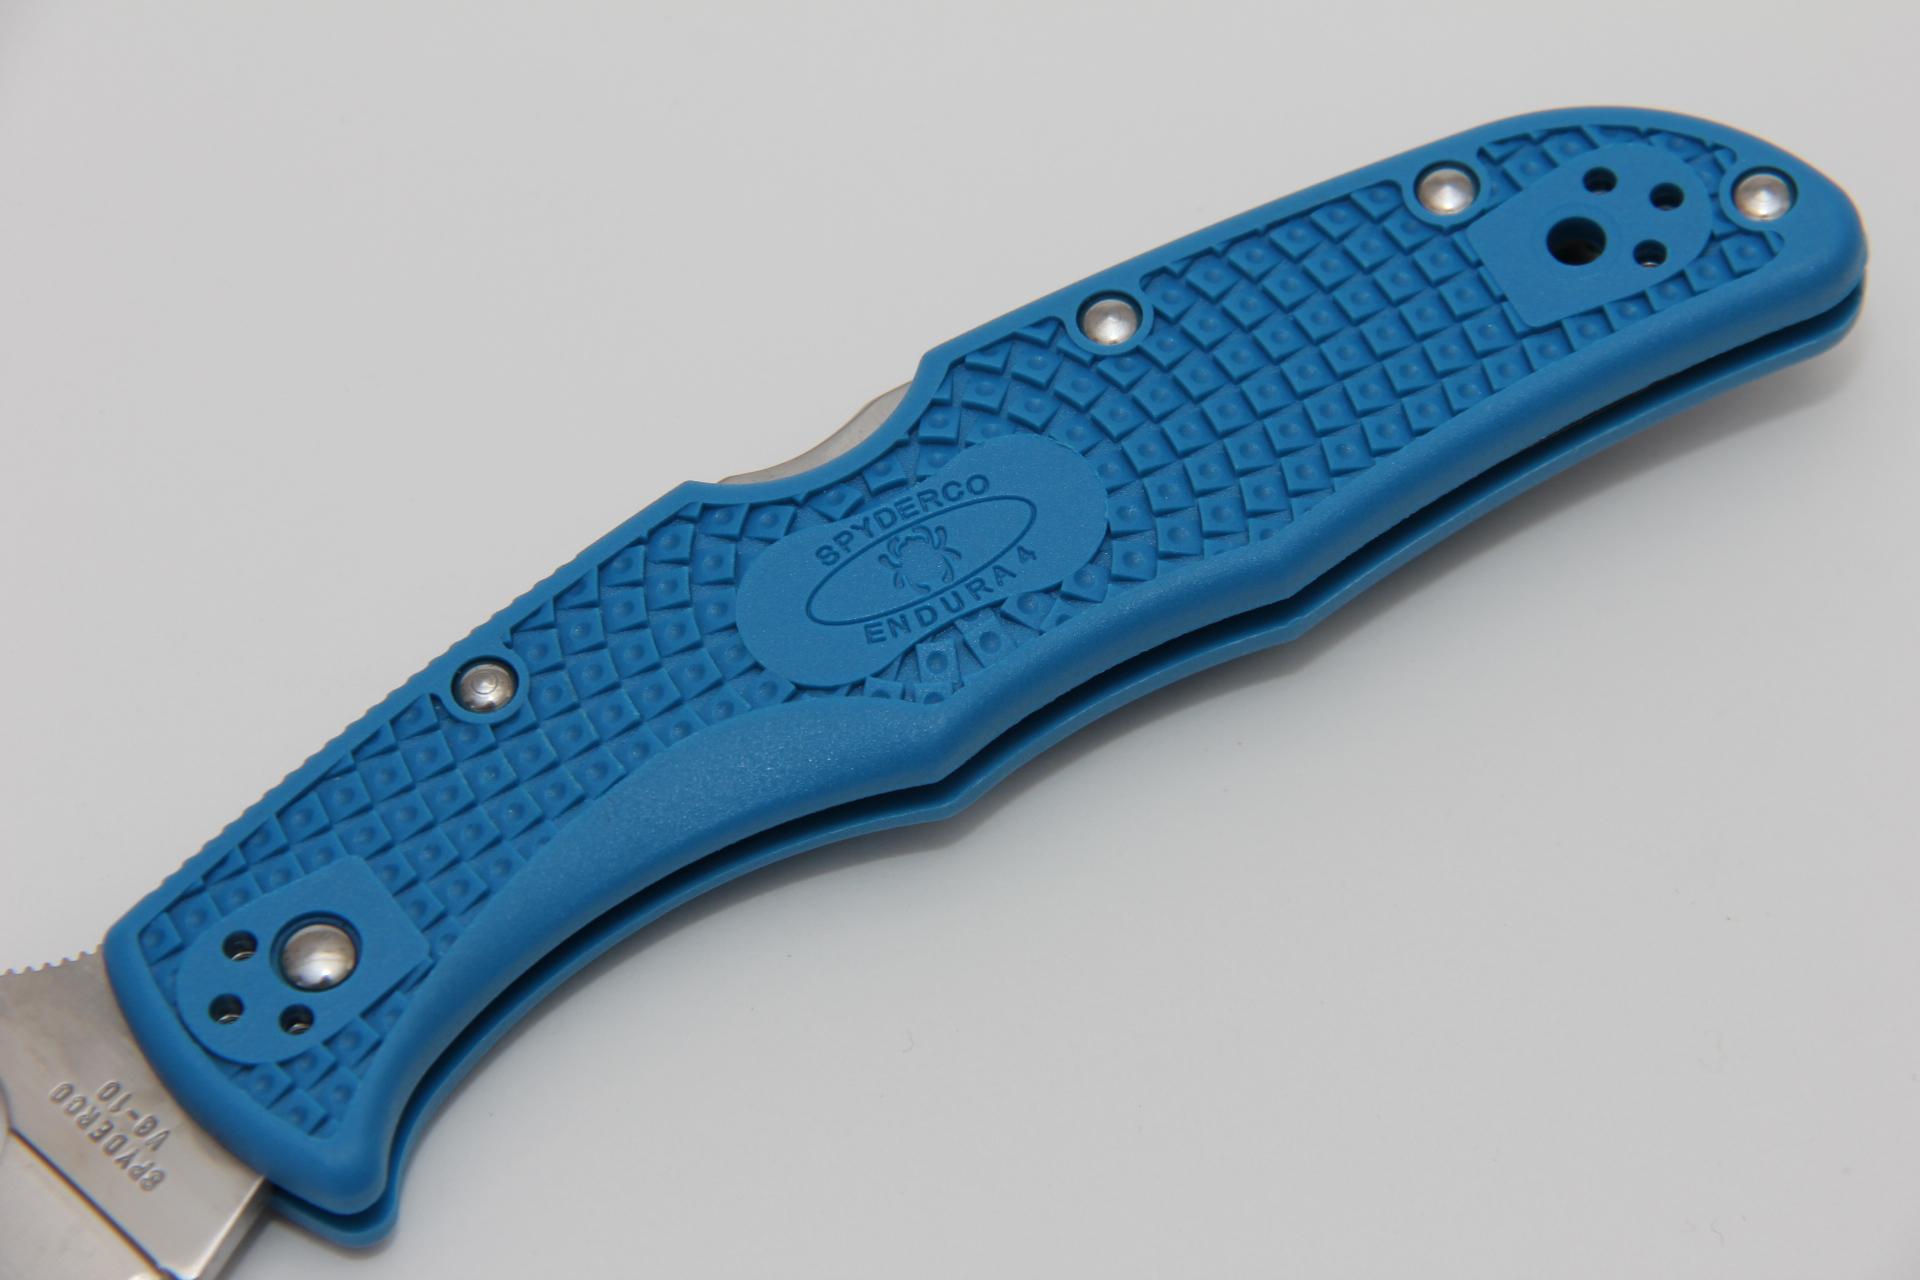 Нож Spyderco Endura Blue SC10FPBL - фотография